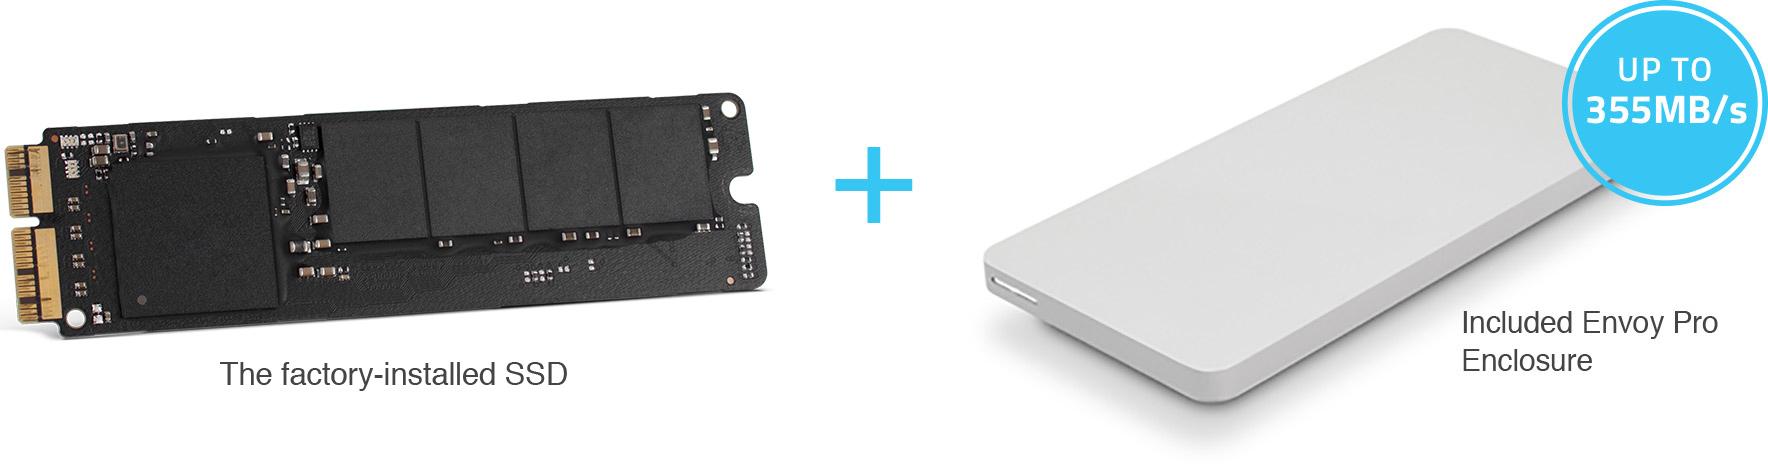 SSD Repurposed Envoy Pro